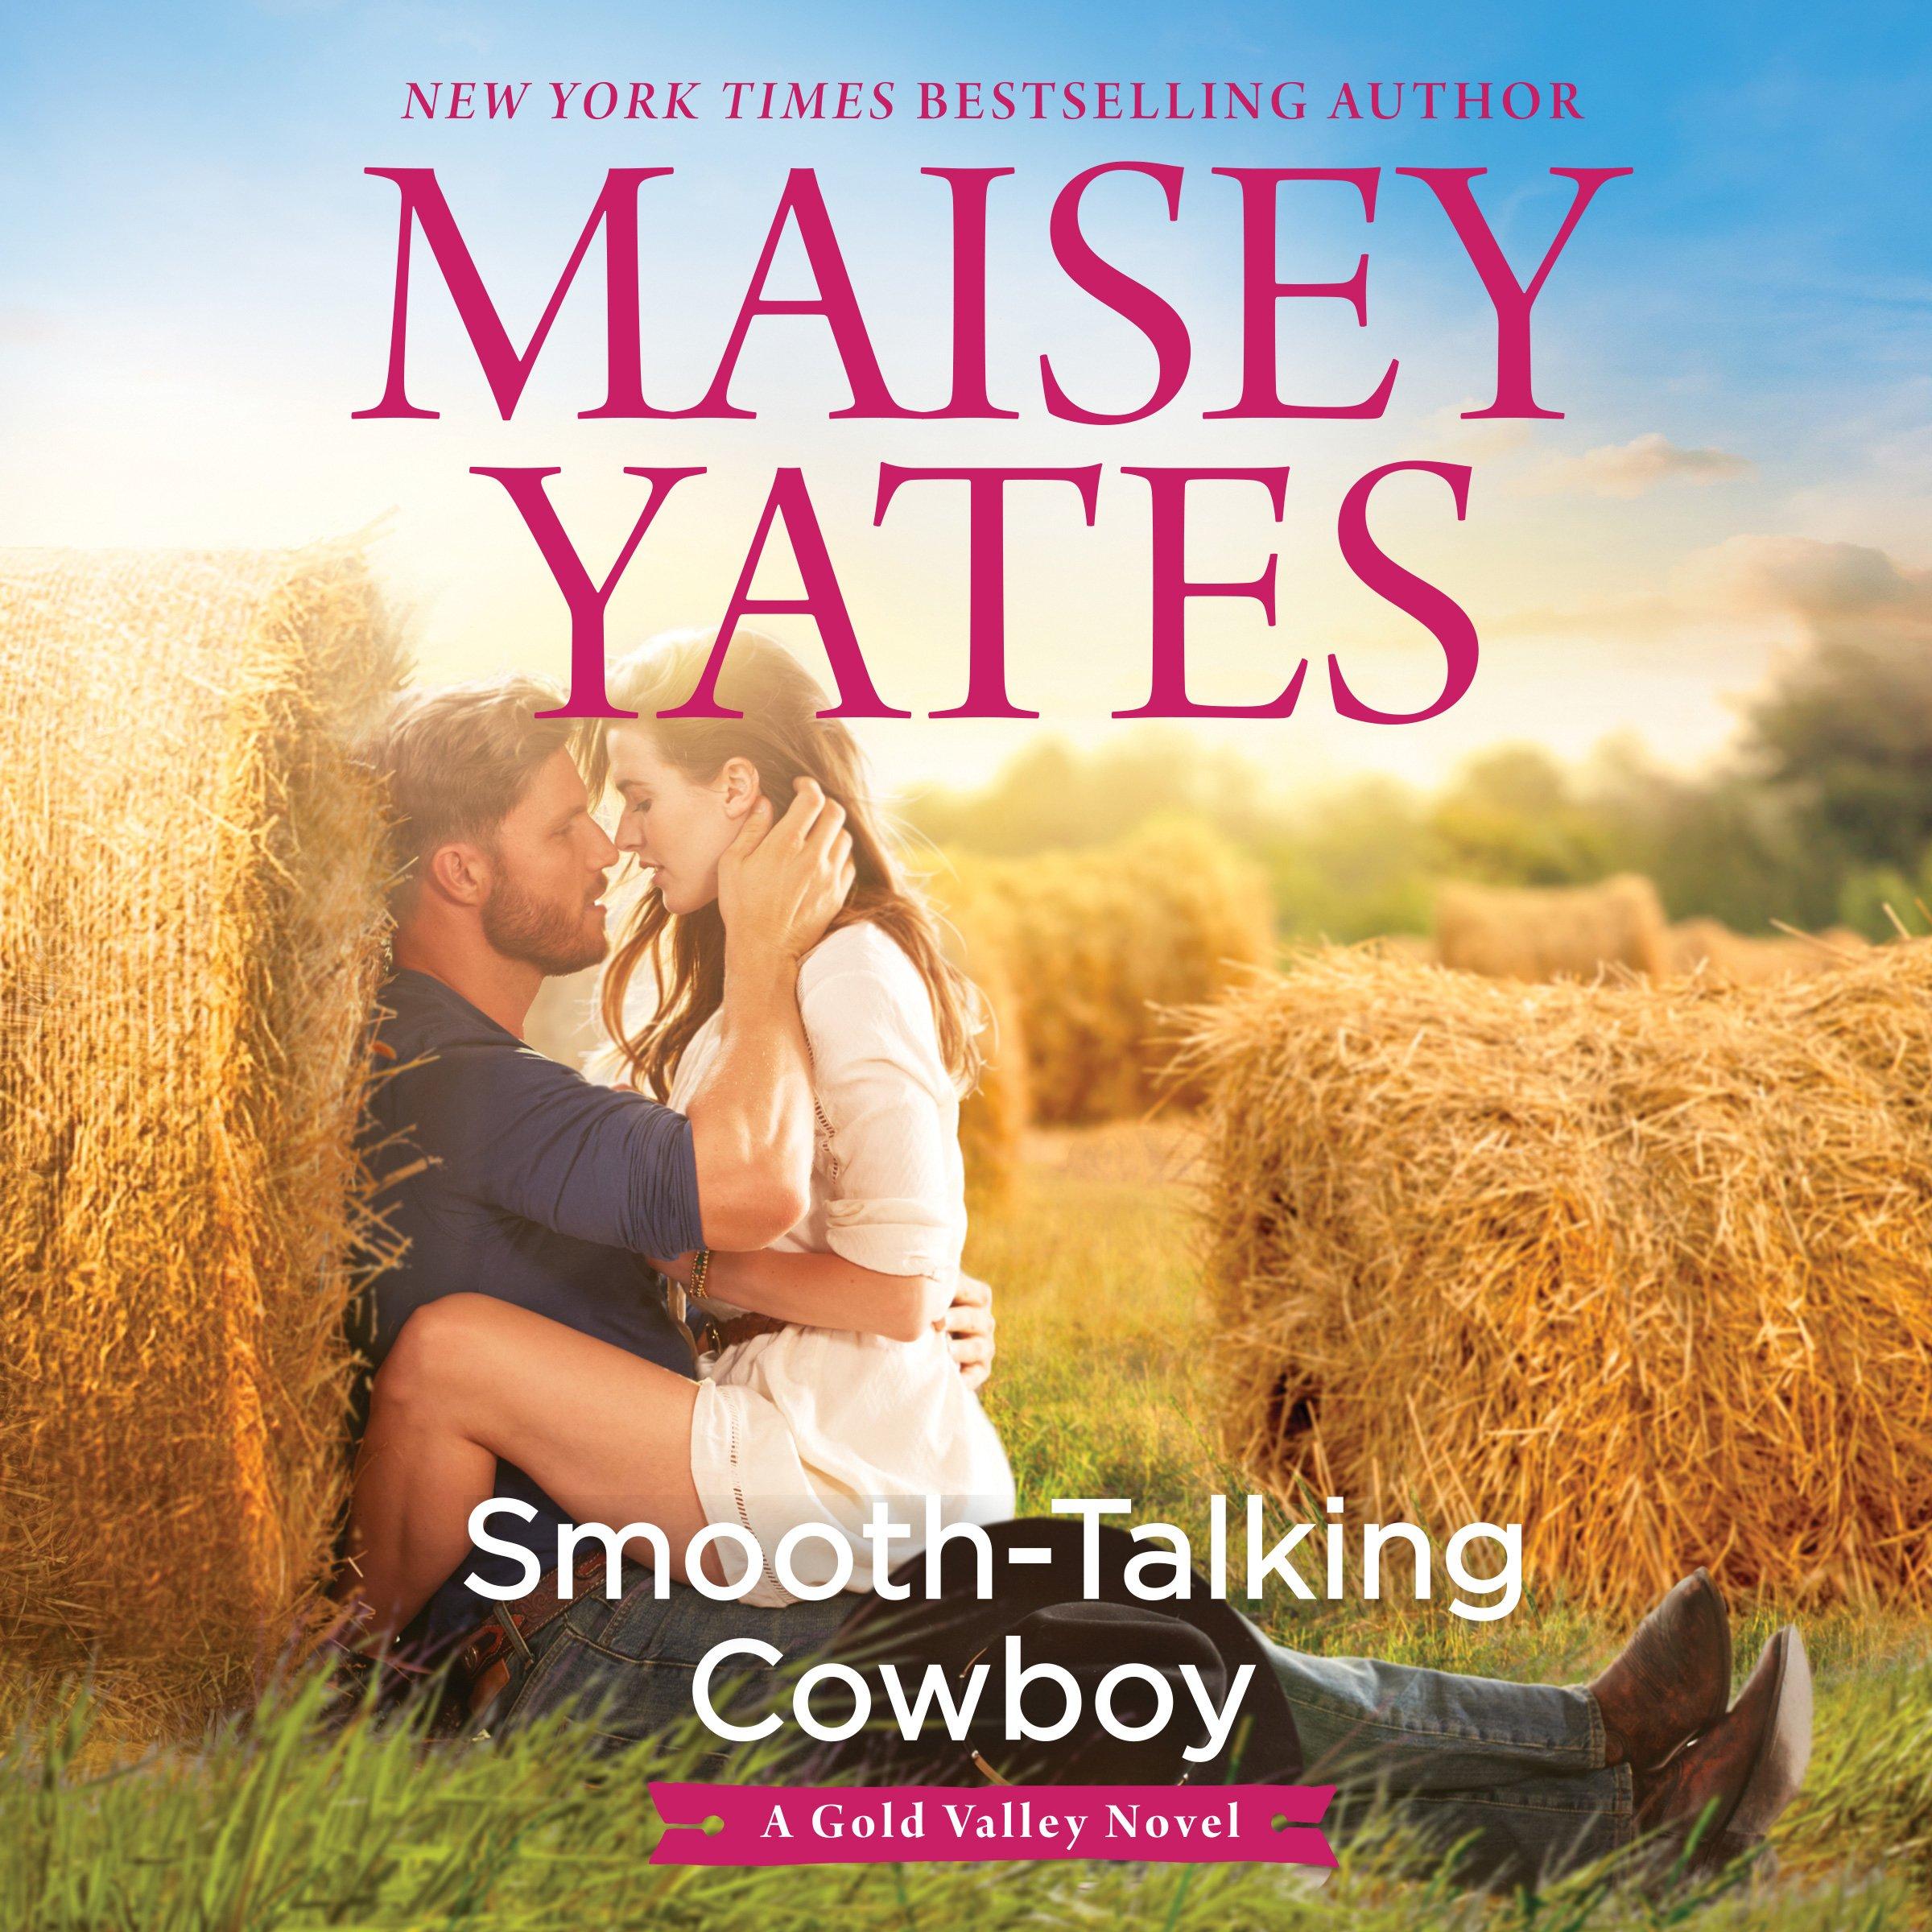 Smooth-Talking Cowboy: A Gold Valley Novel